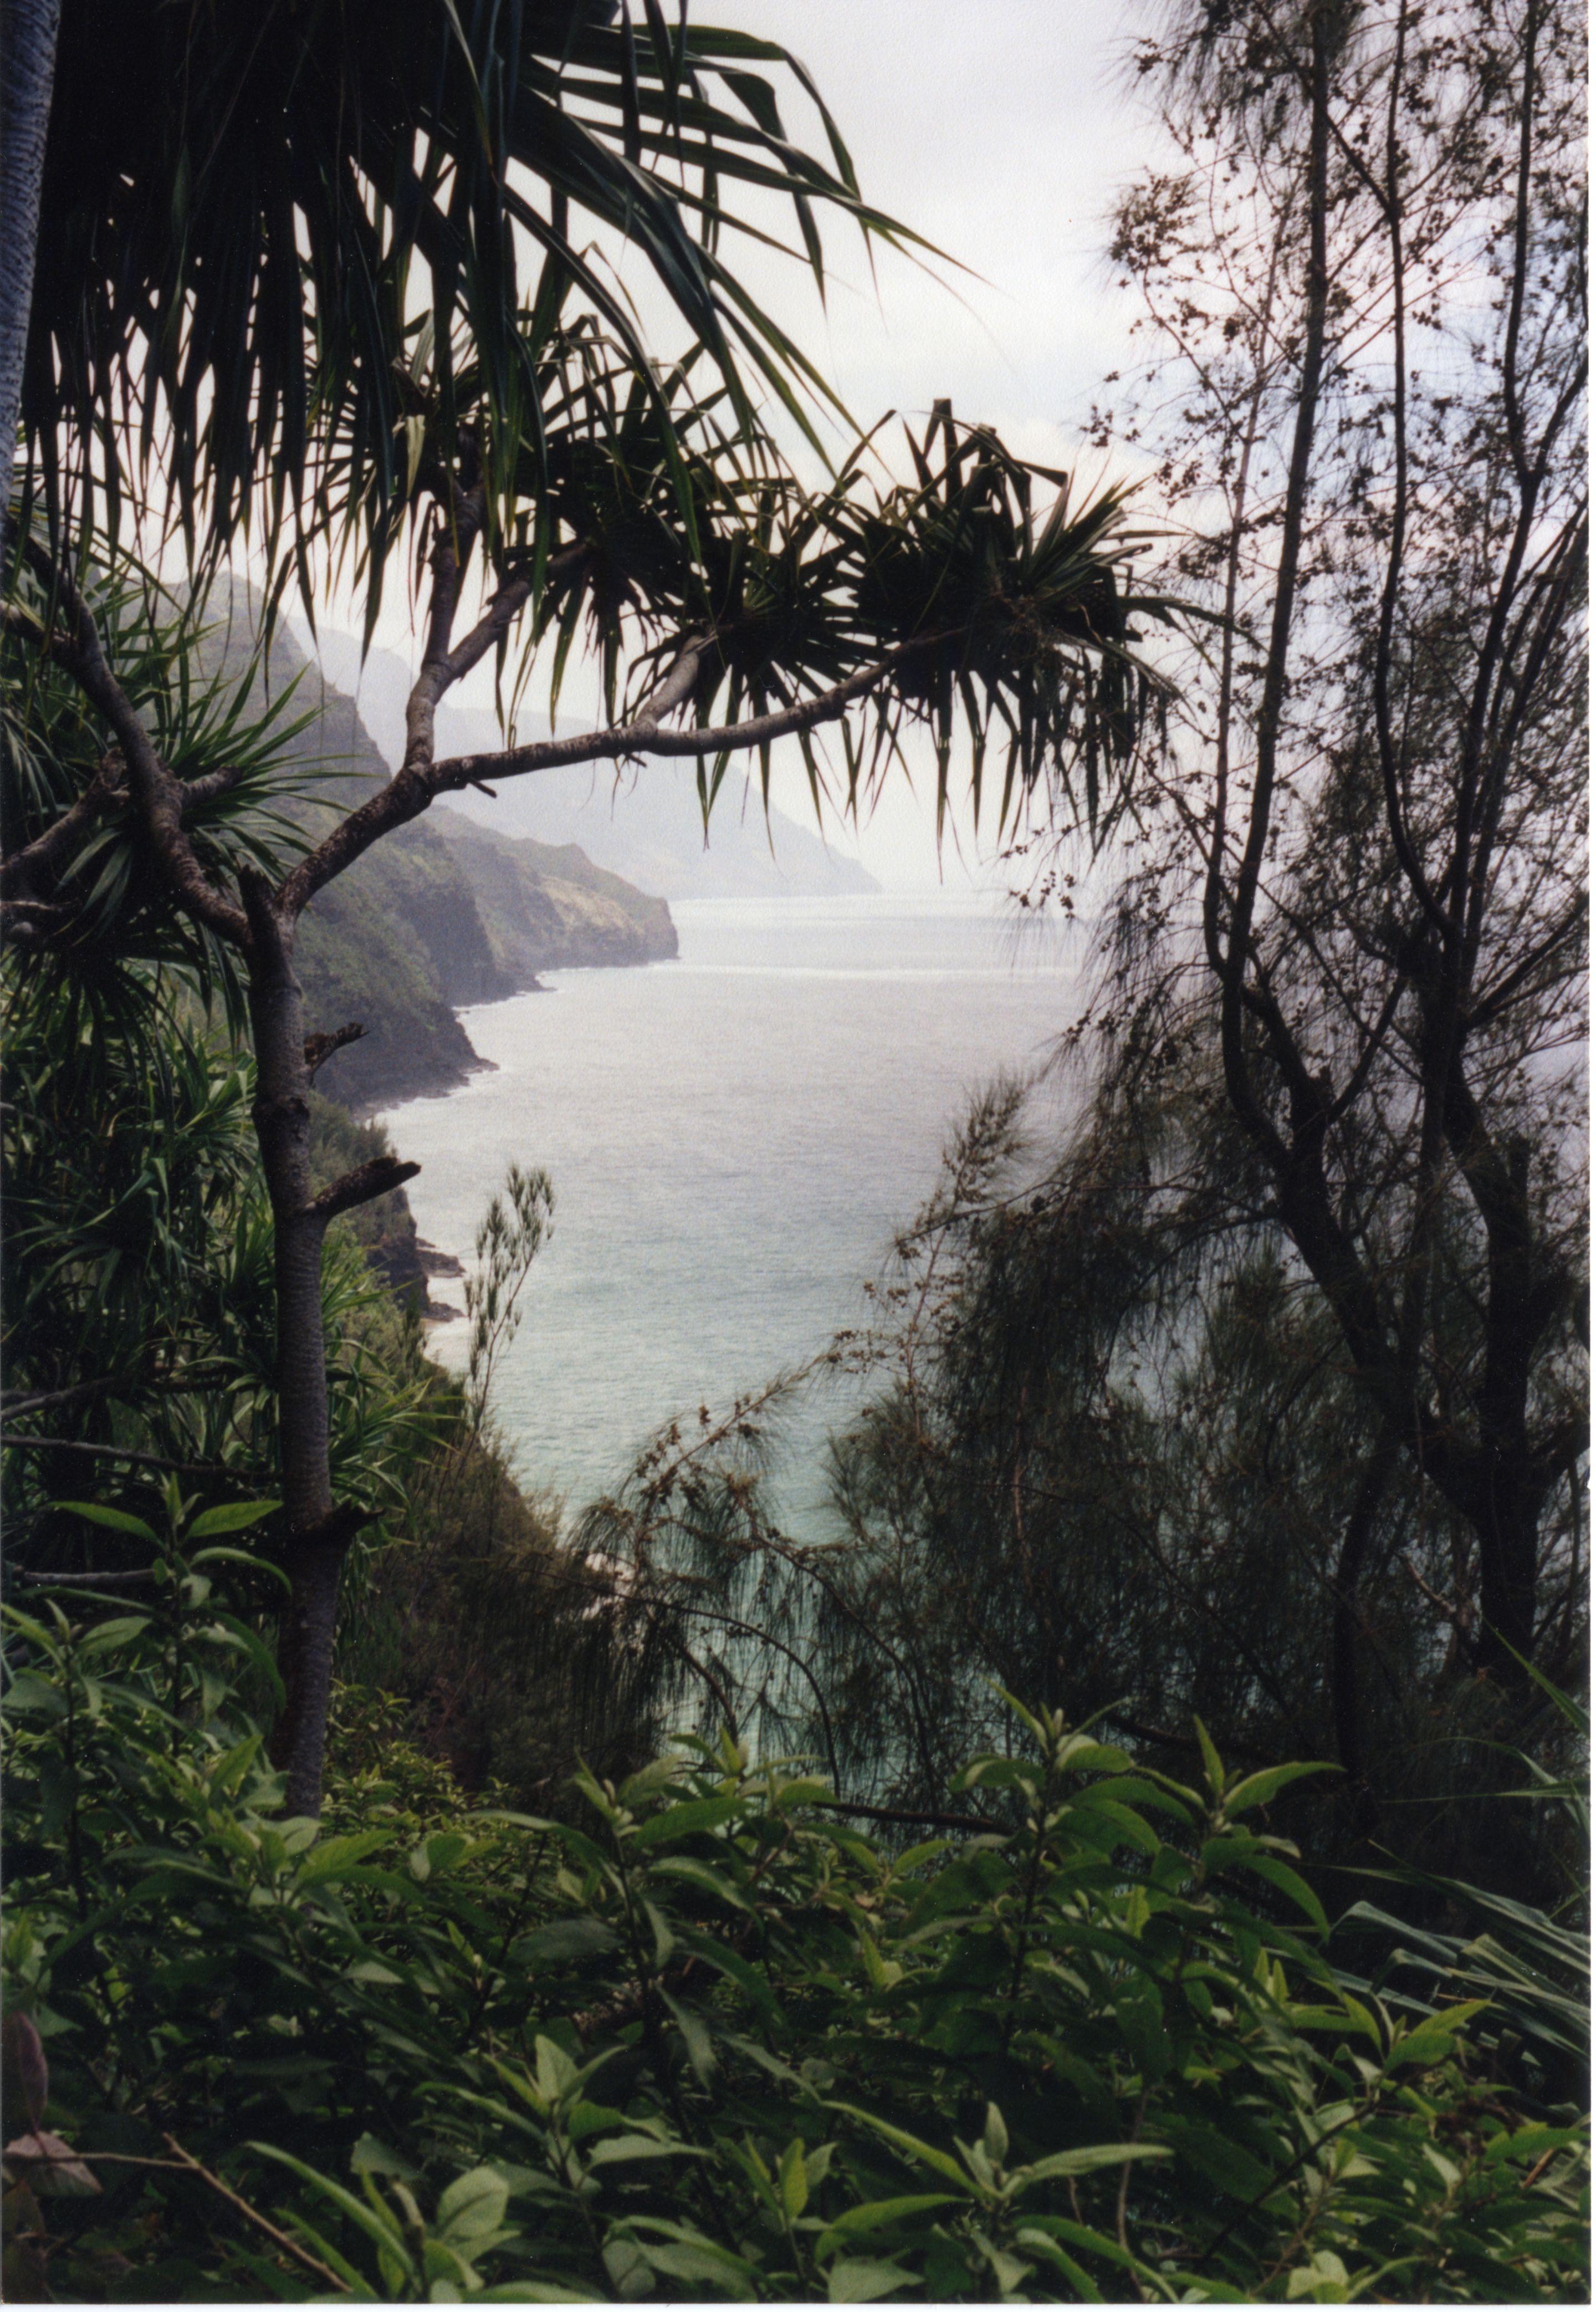 This was taken while hiking the Kalalau Trail in Kauai.